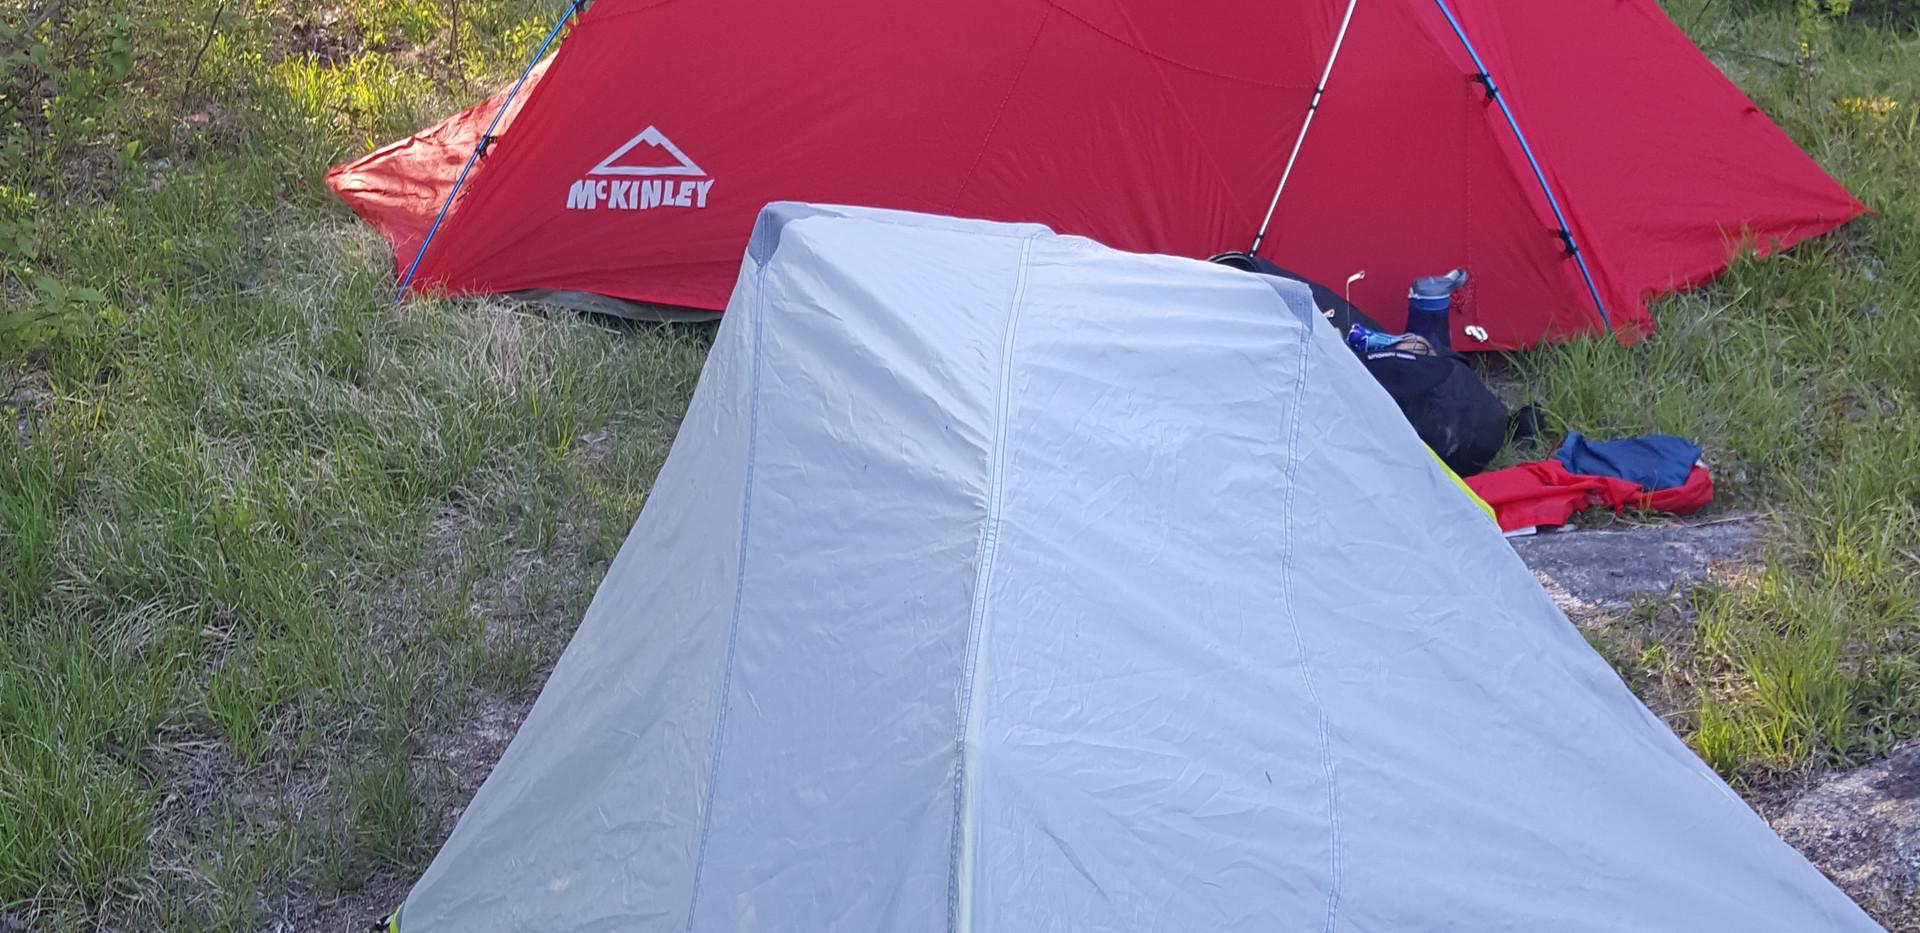 Camping off of Sandy Lake